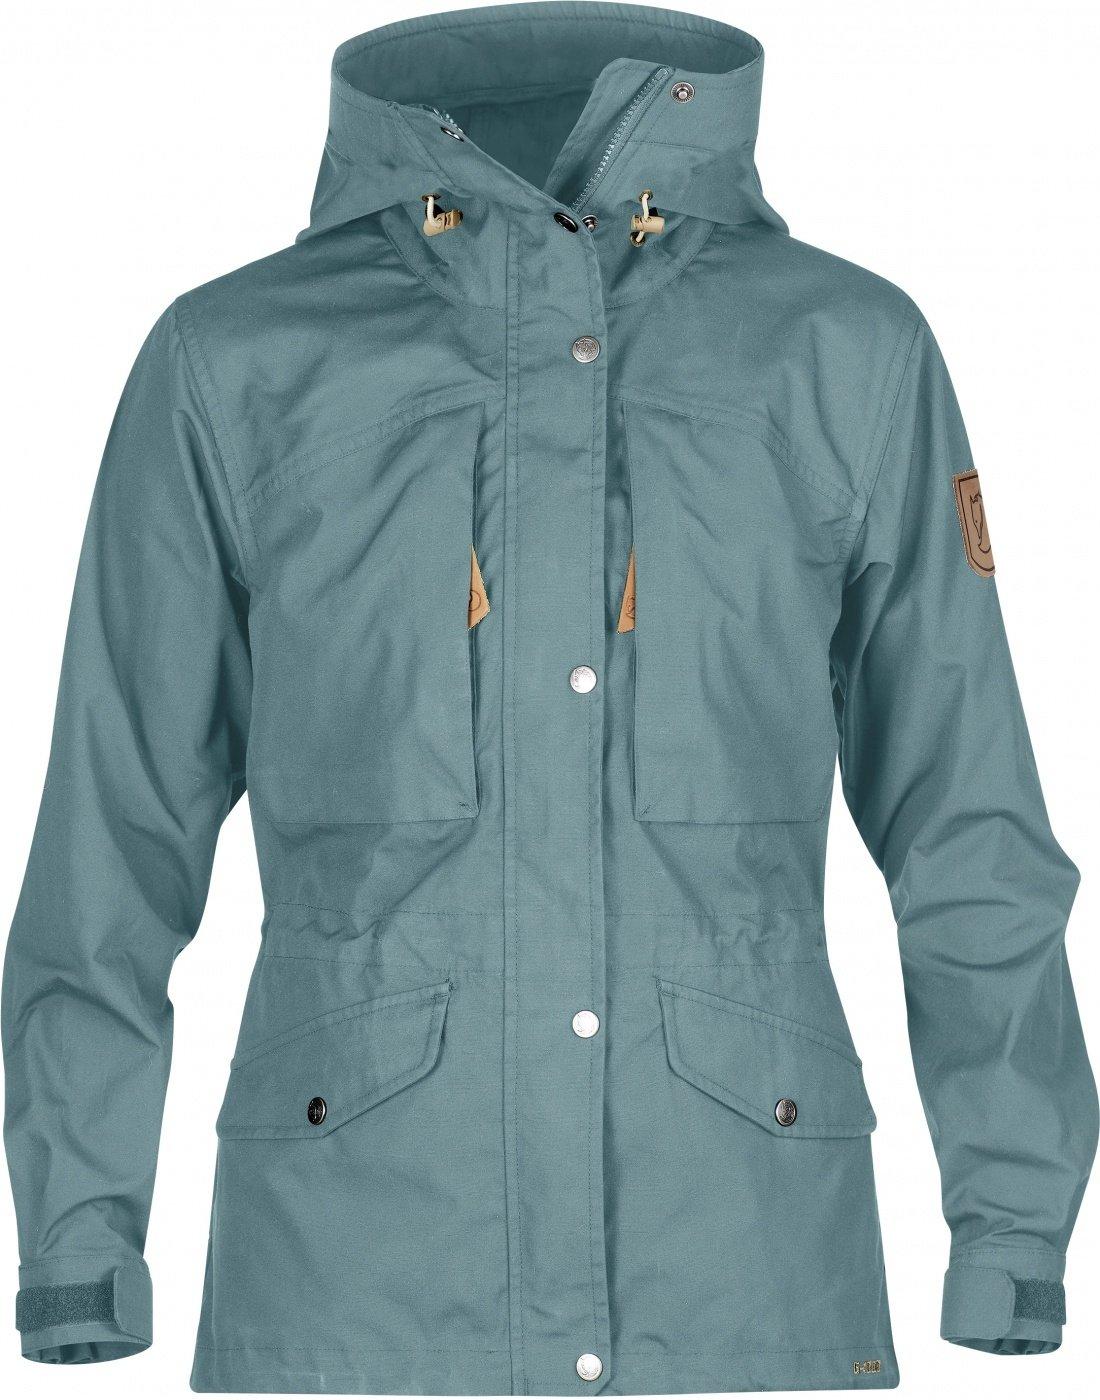 Fjallraven Singi Trekking Jacket - Women's Frost Green X-Small